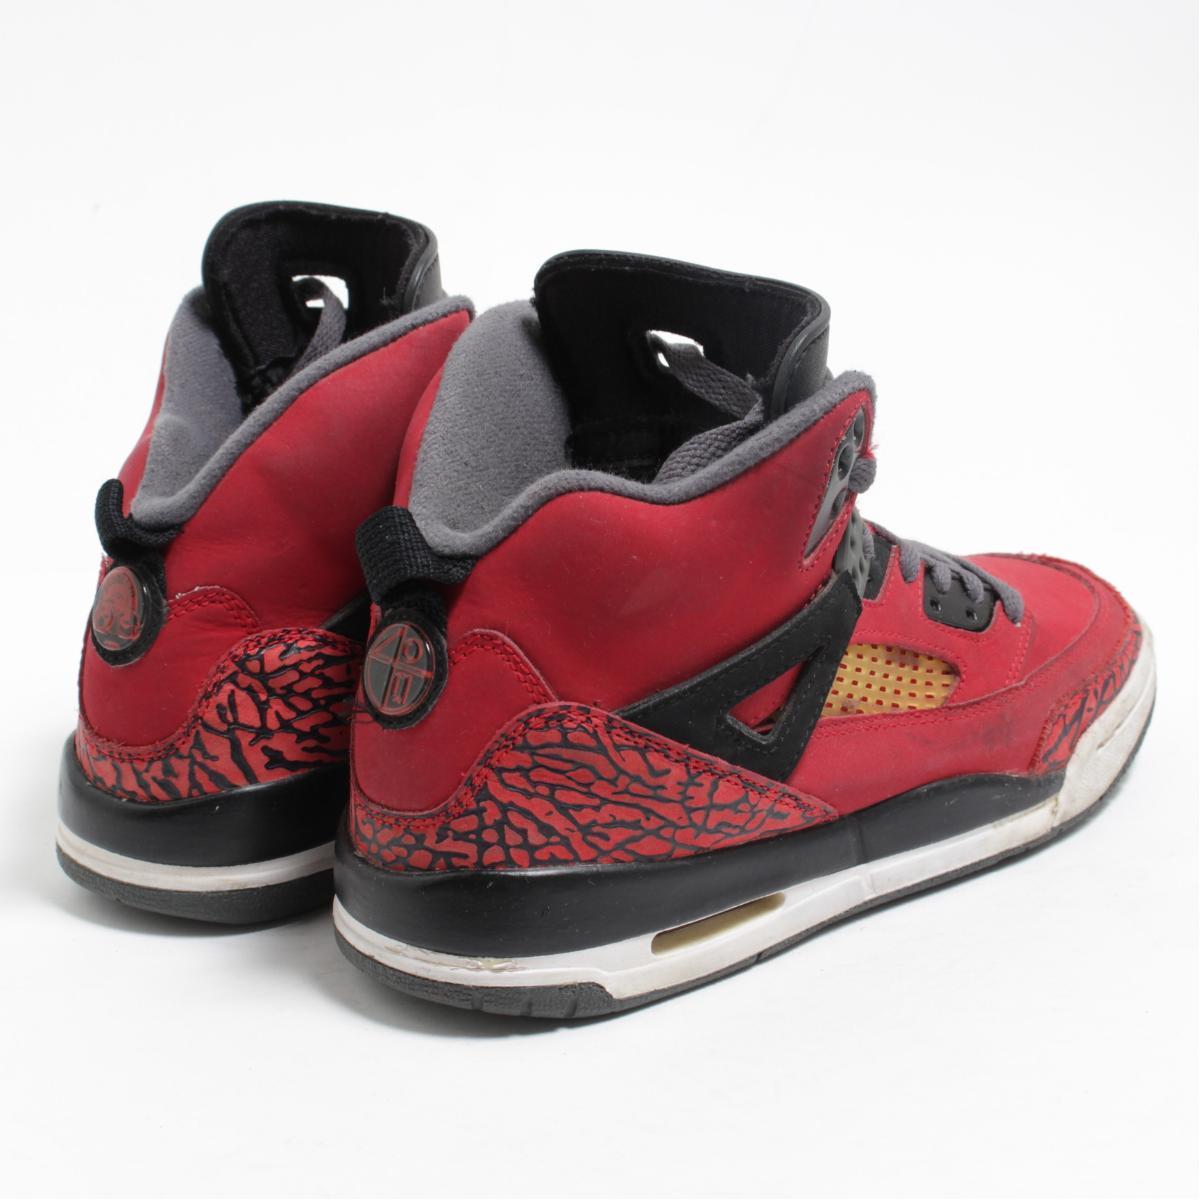 outlet store sale 01f62 d0f81 Nike NIKE AIR JORDAN SPIZIKE sneakers US5.5Y Lady s 24.0cm  bom4281